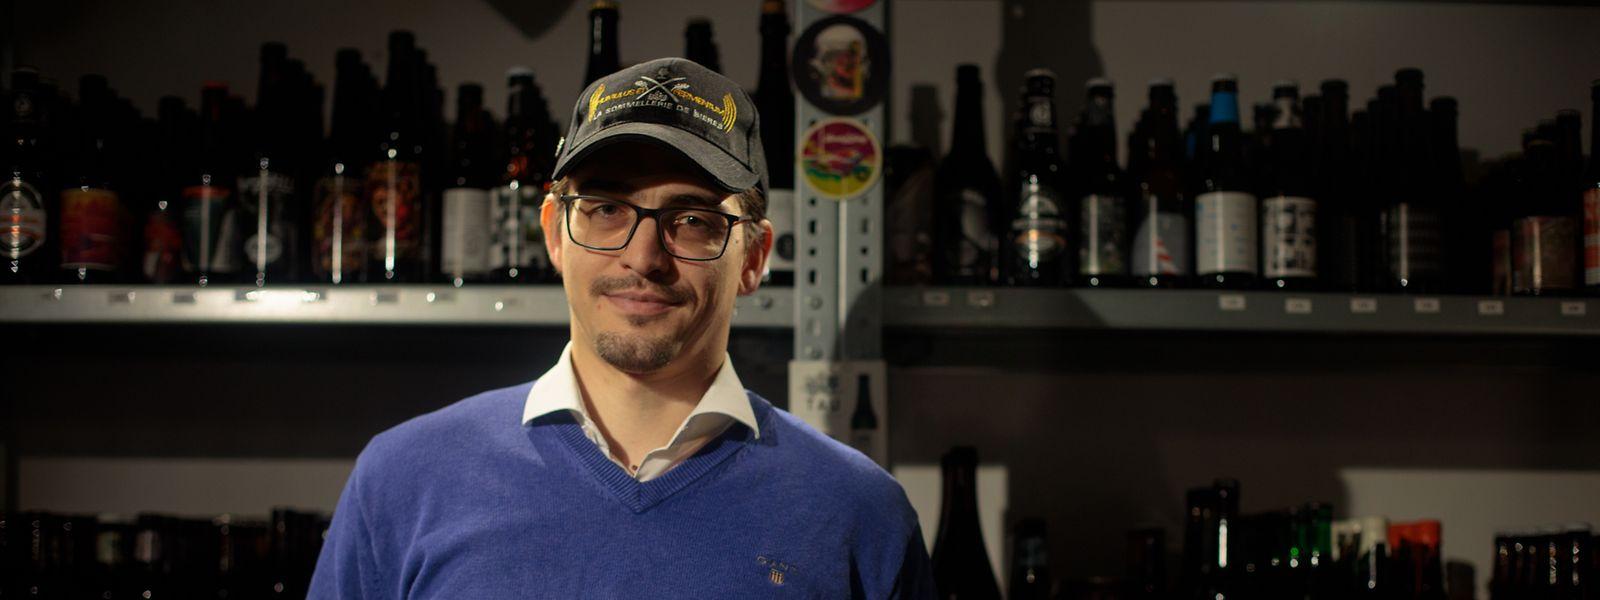 Sebastian Symolka hat etwa 200 Biersorten angesammelt.